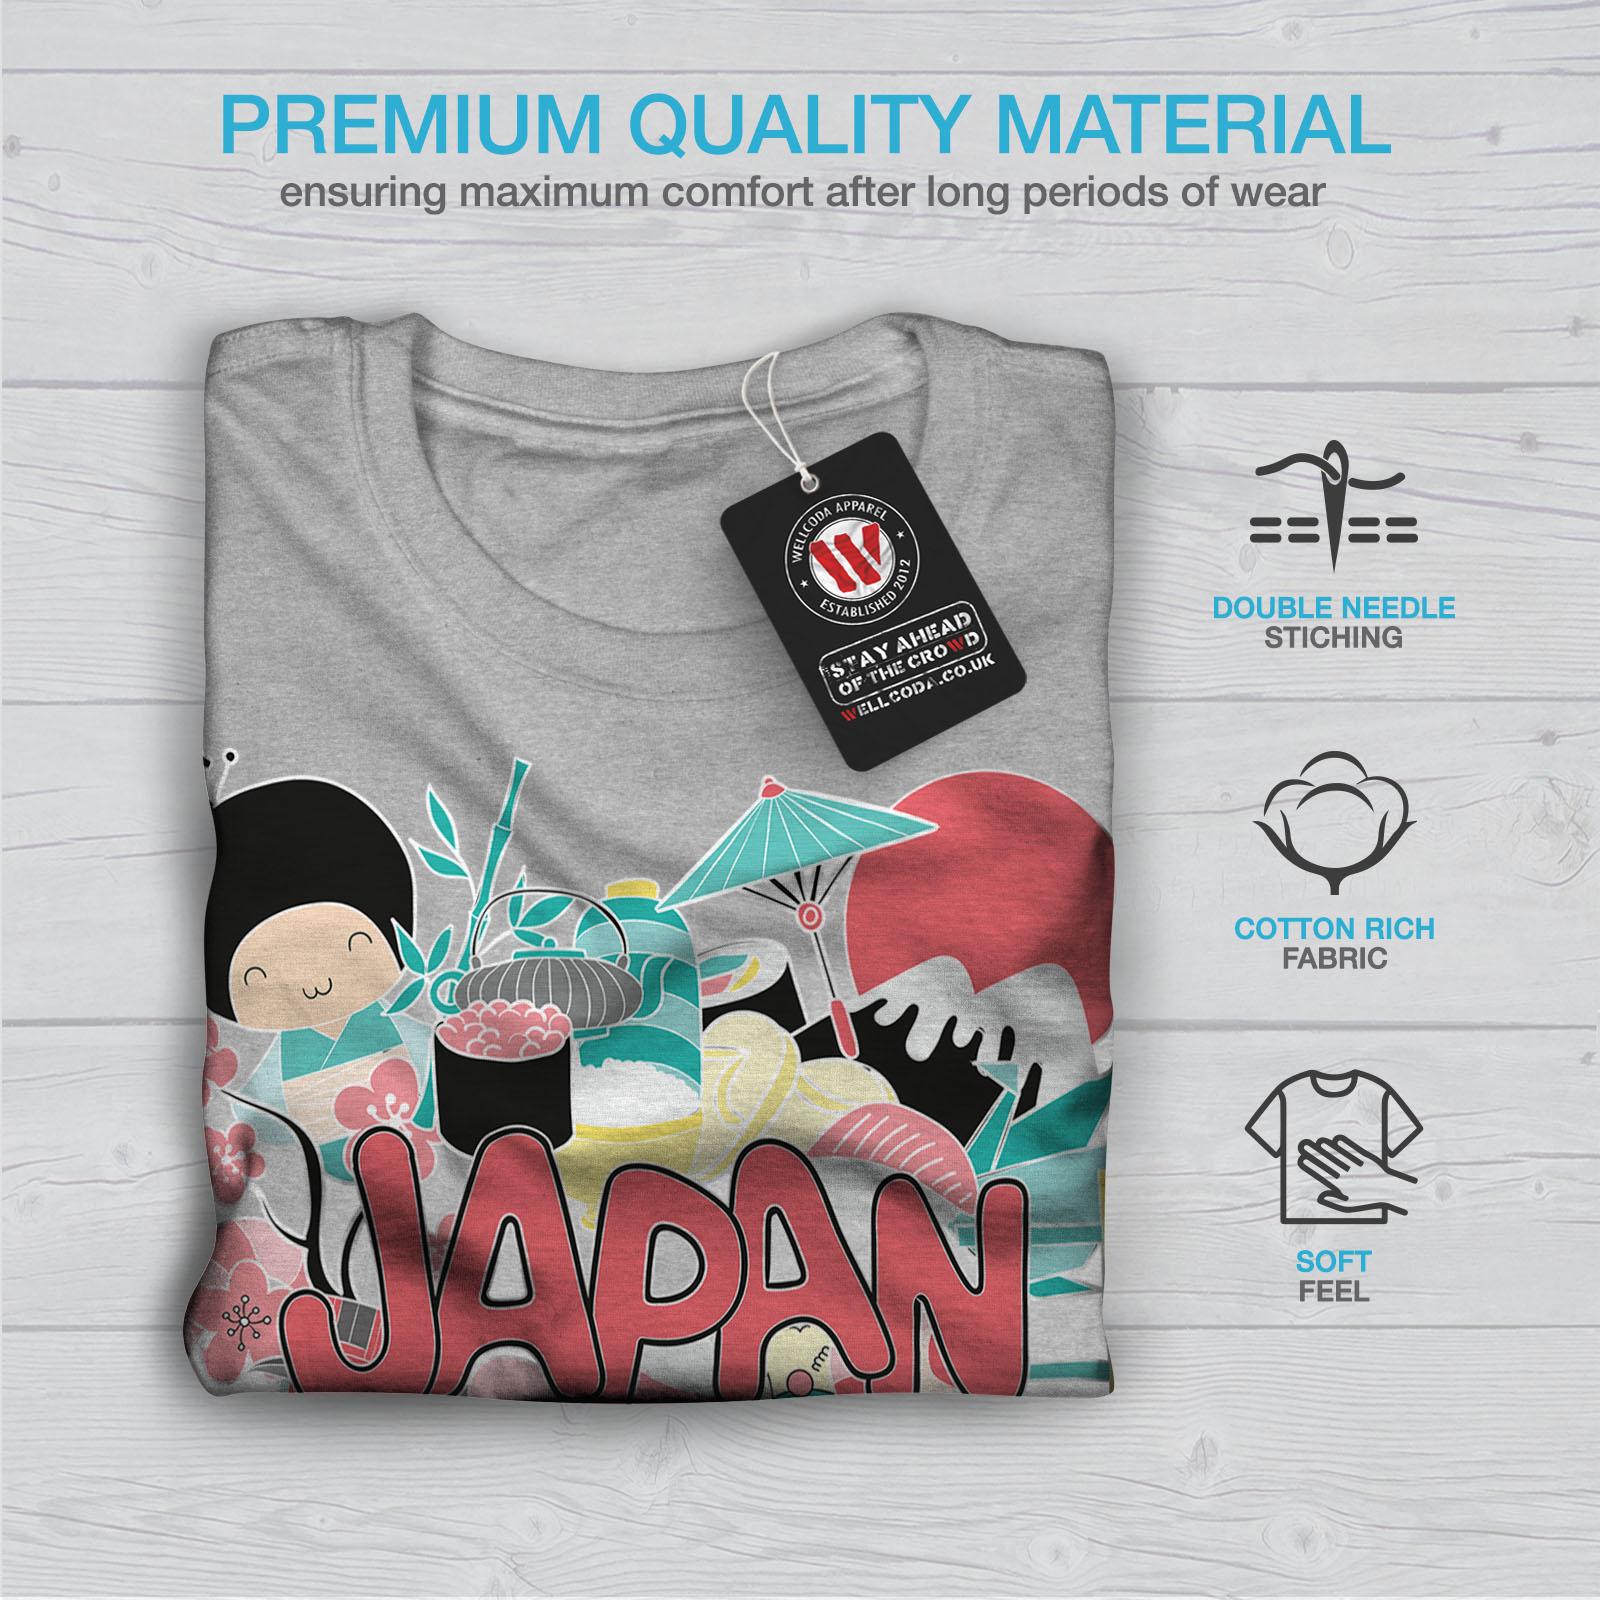 Wellcoda Japan Culture Mens T-shirt Culture Graphic Design Printed Tee